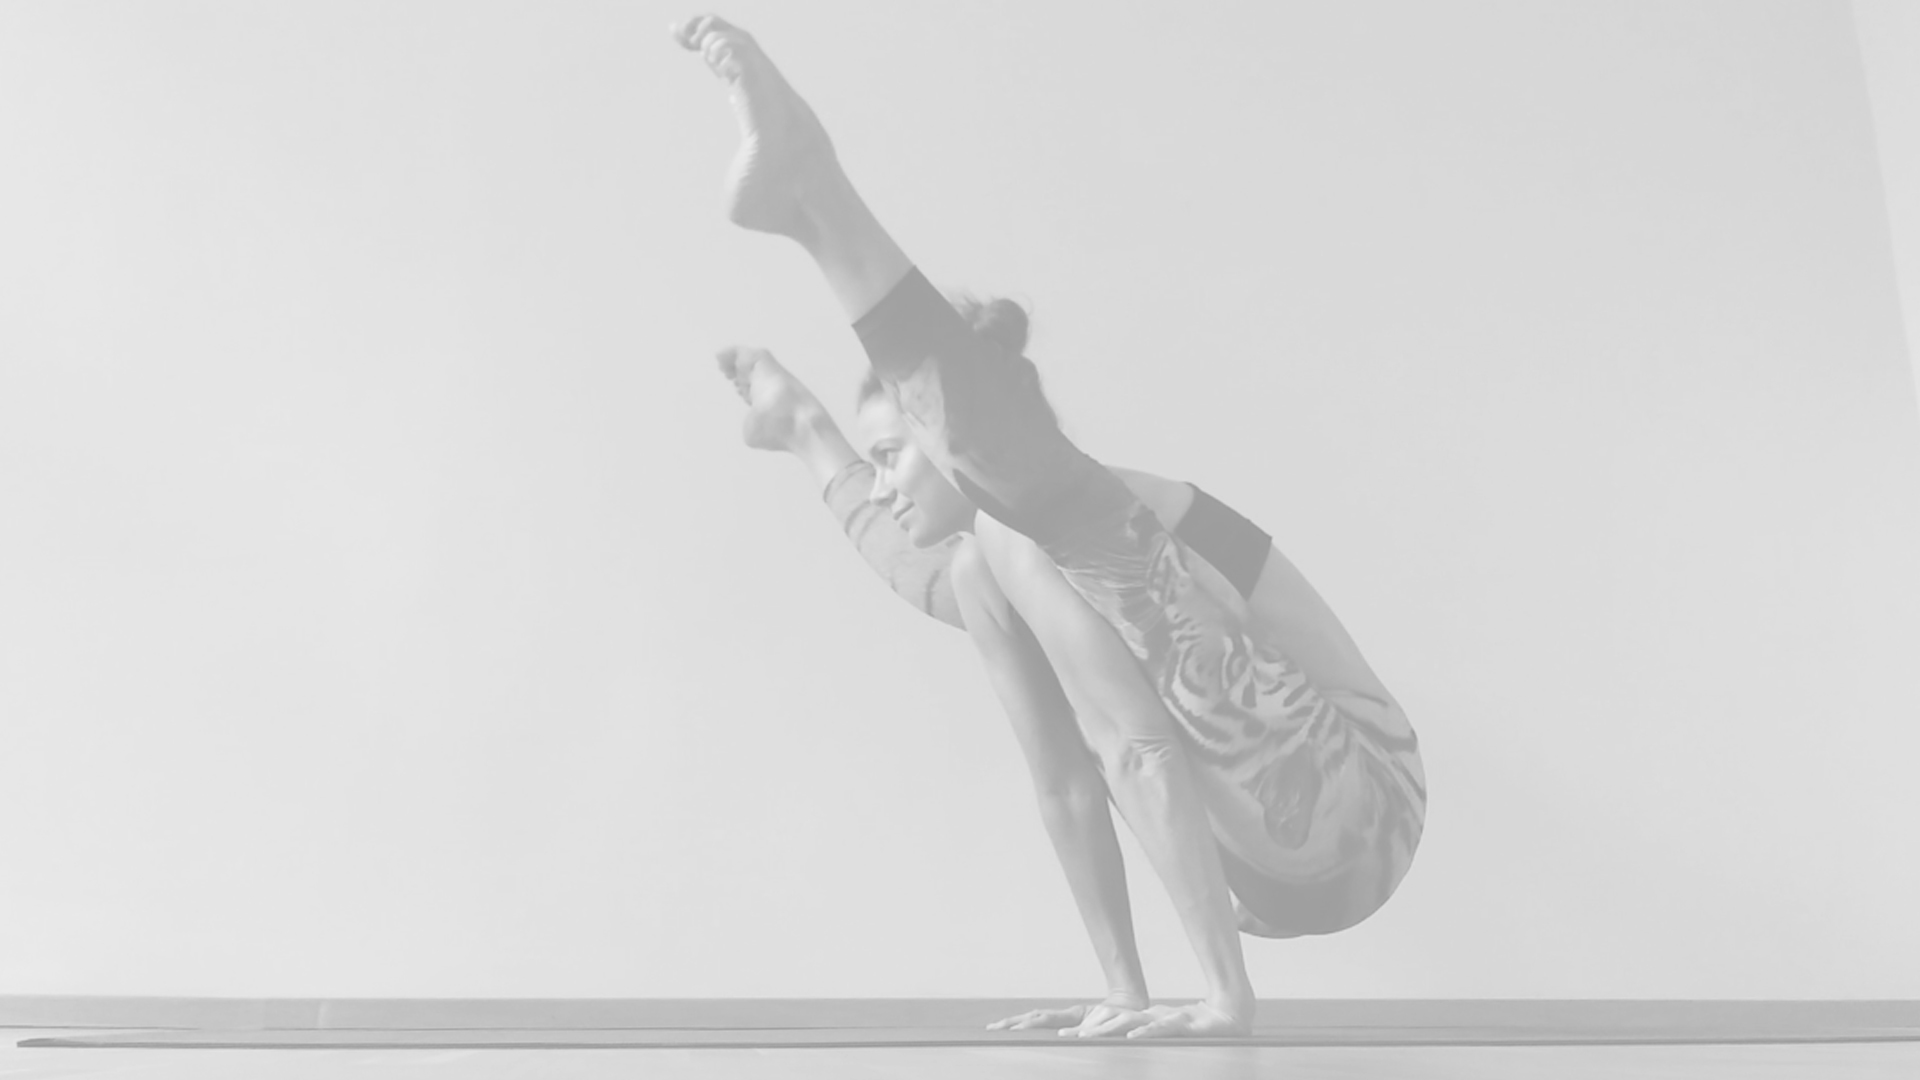 tittibhasana_fayechiyoga_yoga_firefly